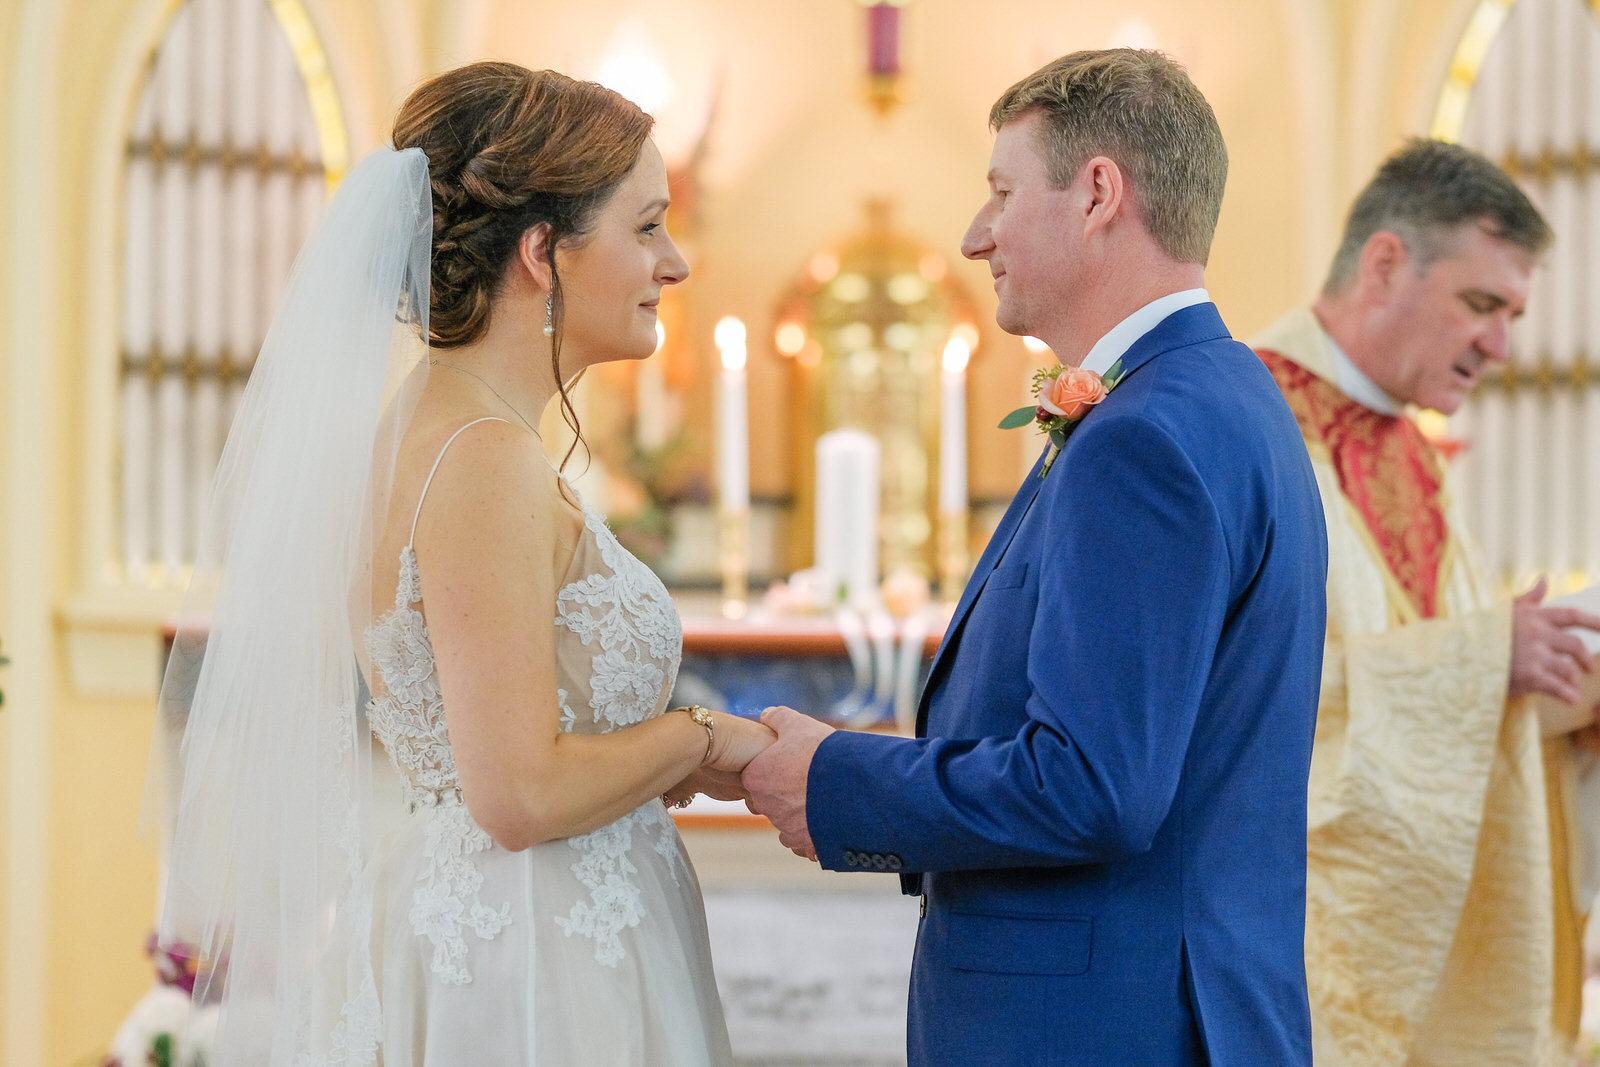 Zorvino-Vineyards-Fall-Wedding-Photography-344.jpg